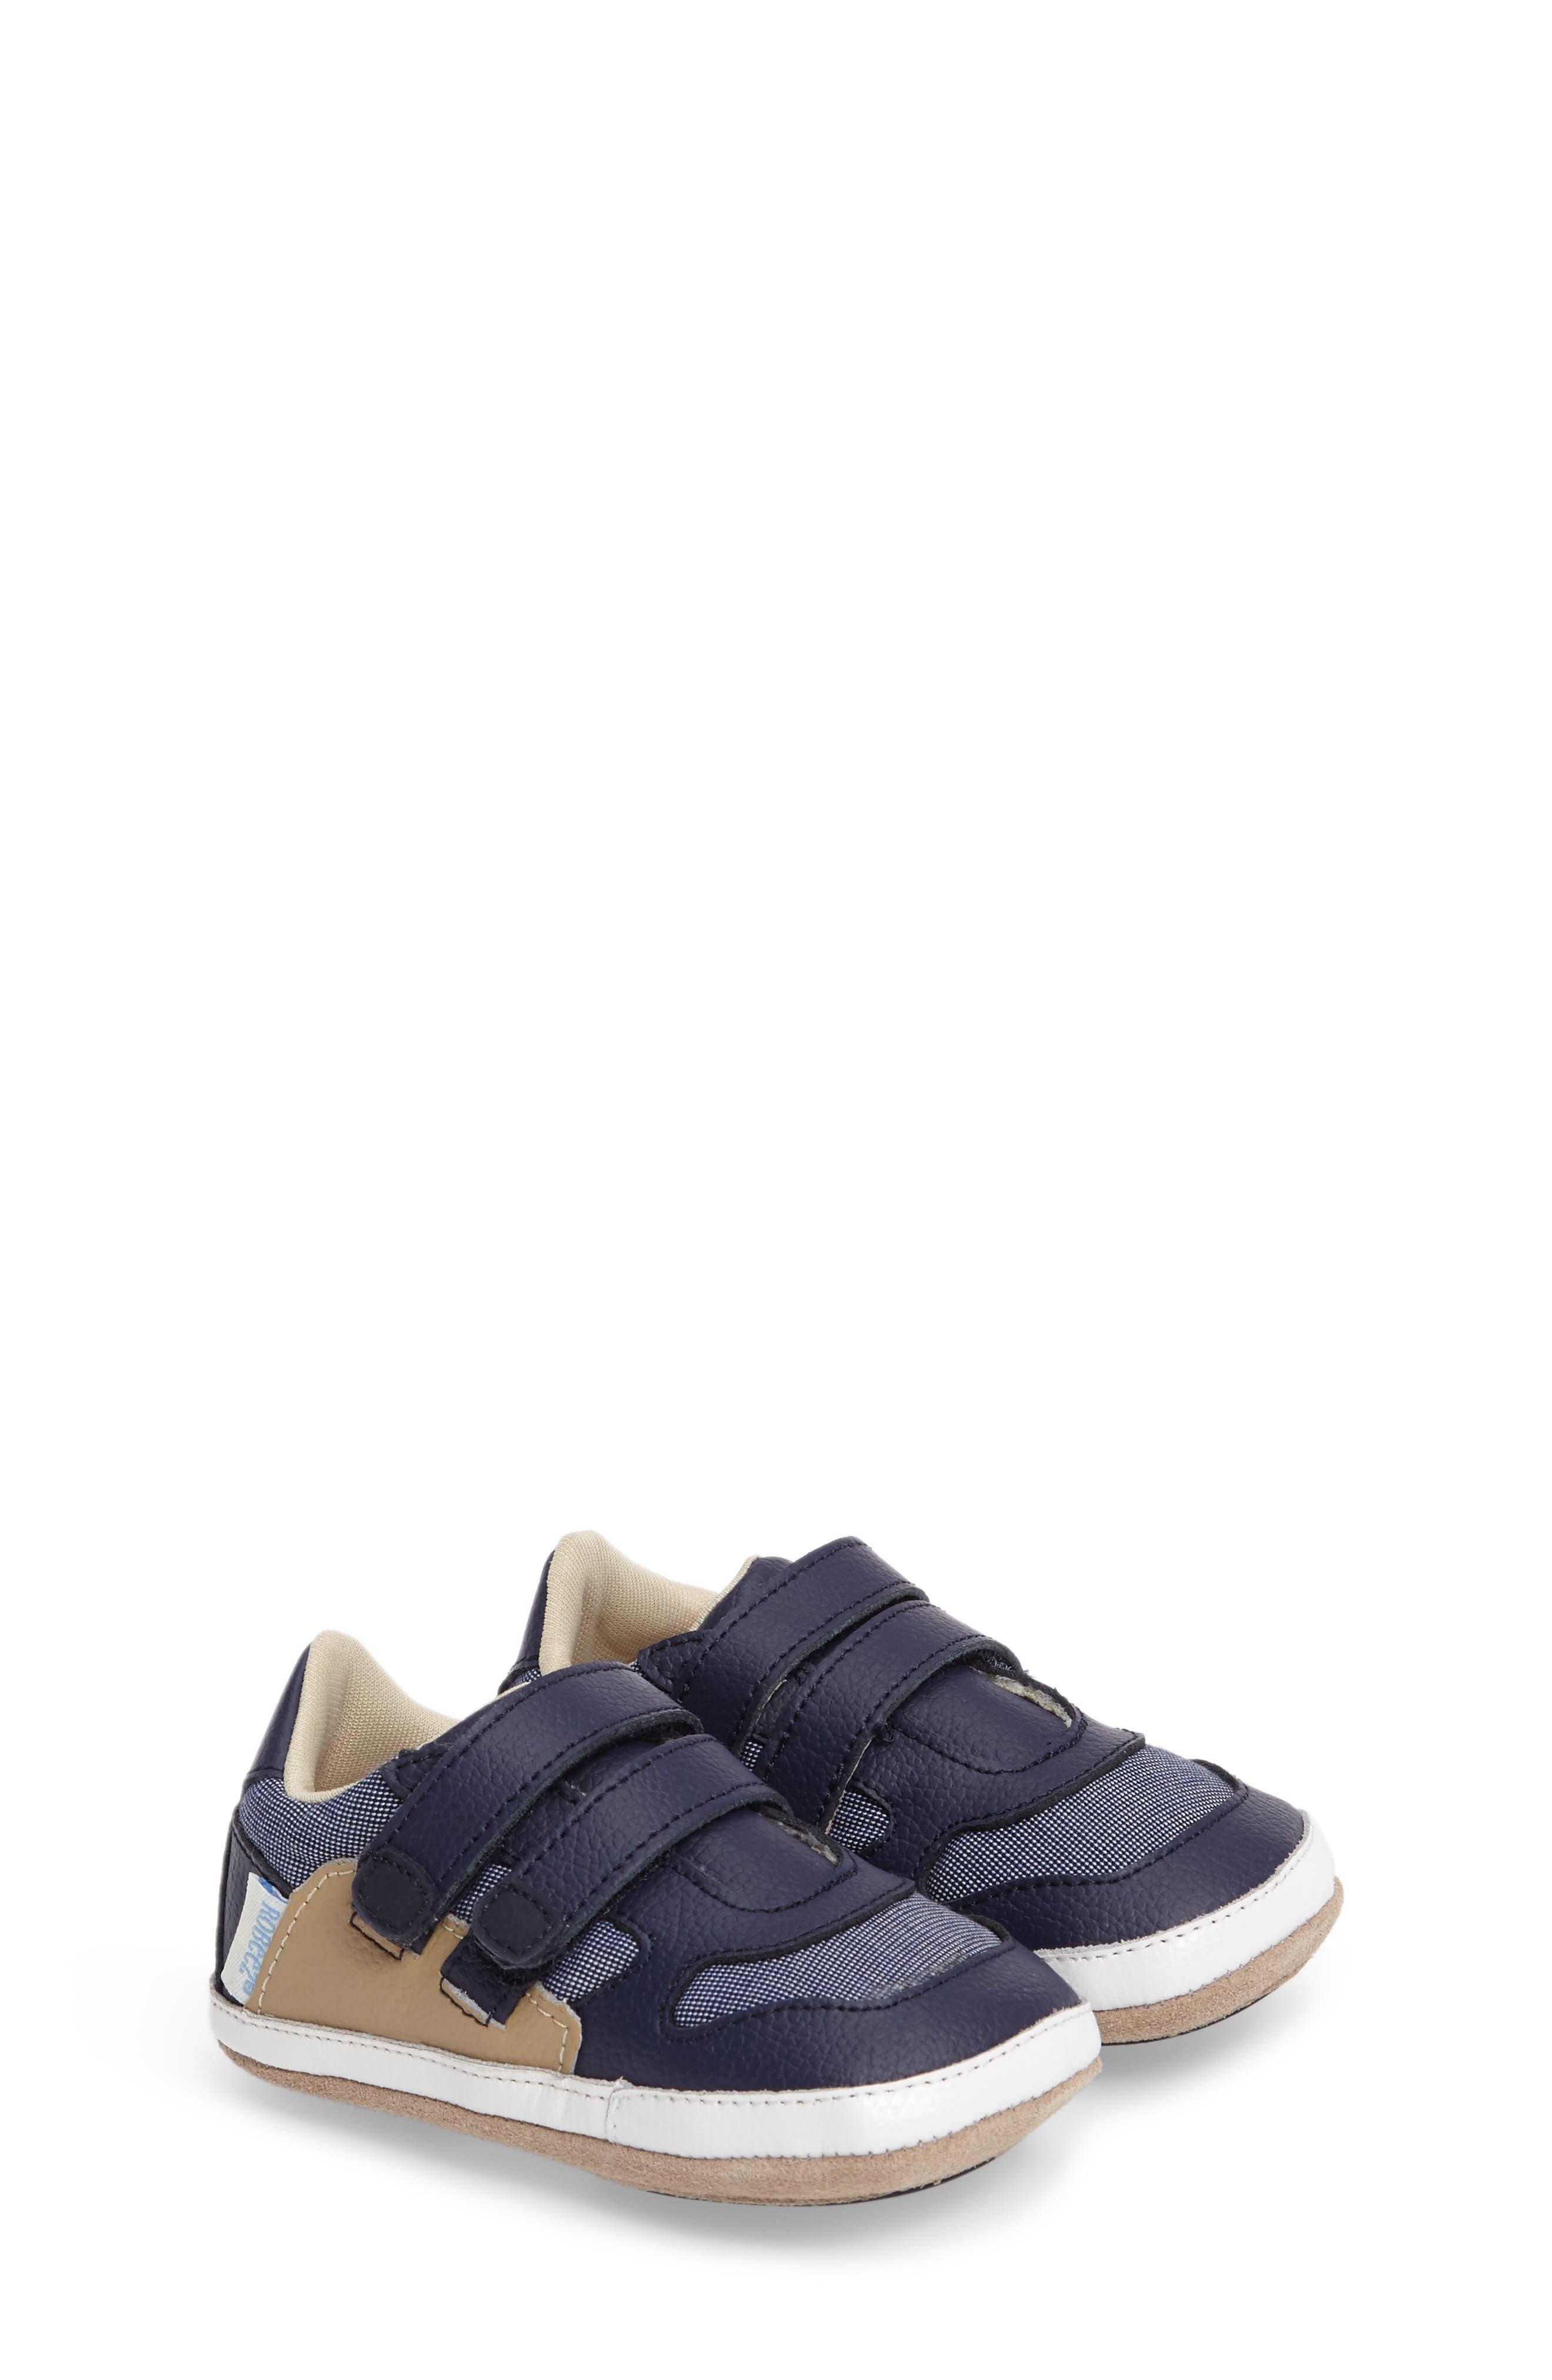 Main Image - Robeez® Jaime Crib Shoe (Baby & Walker)